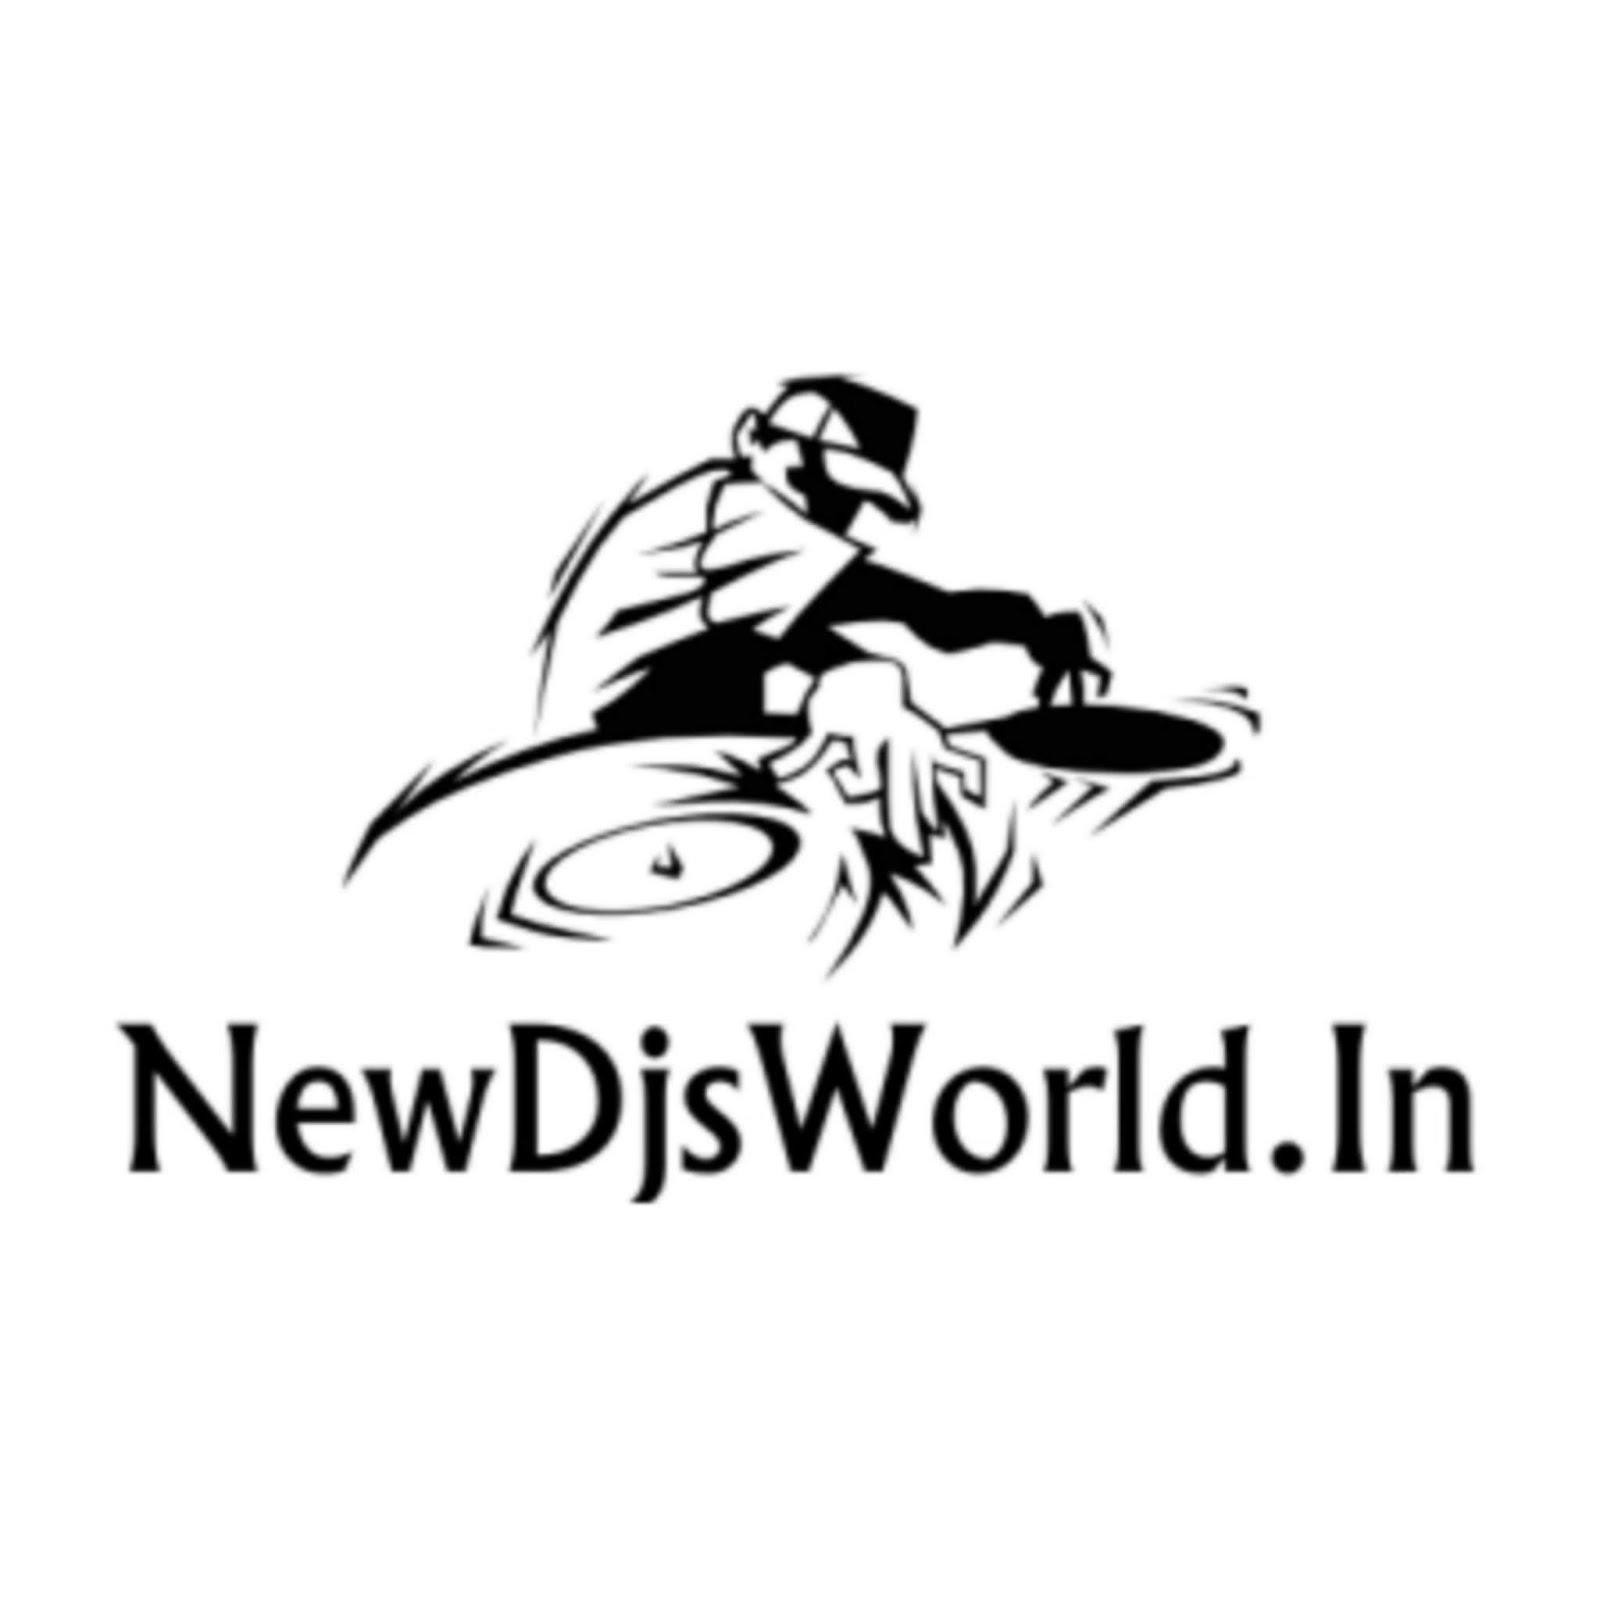 NewDjsWorld In | Telugu Dj Mp3 Songs 2019 Download | Telugu